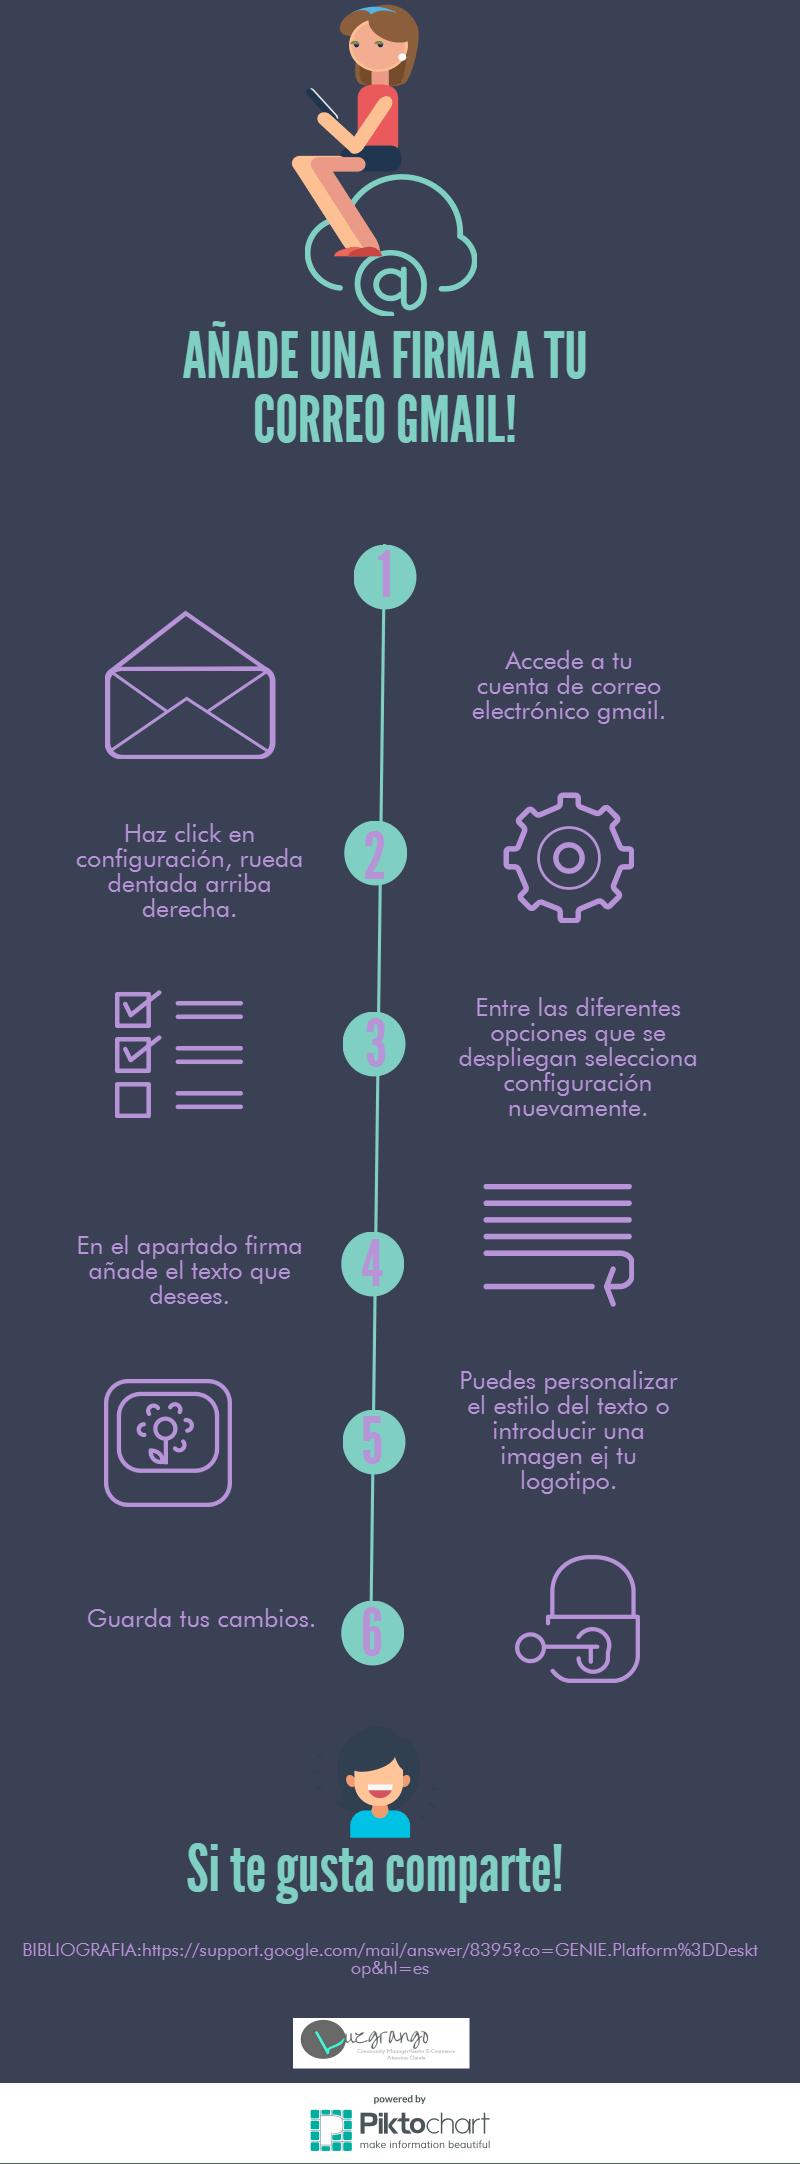 Añade una firma a tu correo Gmail